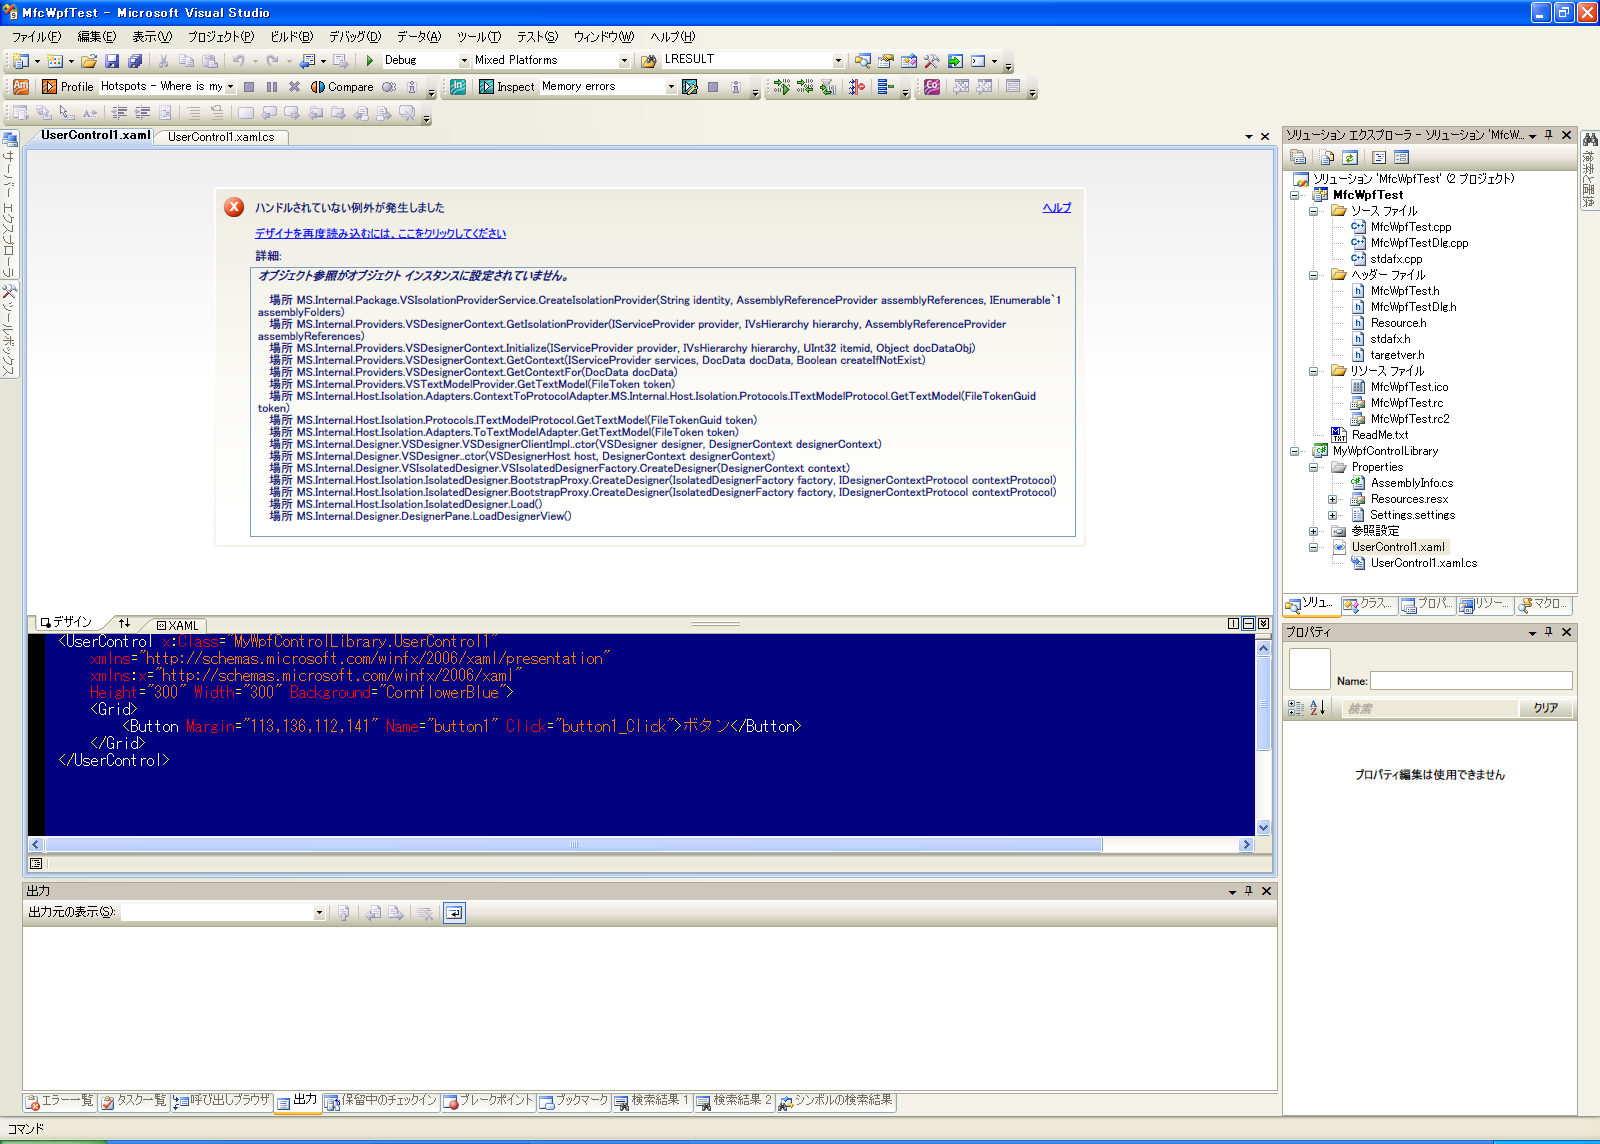 https://sygh-jp.github.io/content_hosting/my_program_ss/Wpf_Designer_Error_ss_2010_05_31d.png